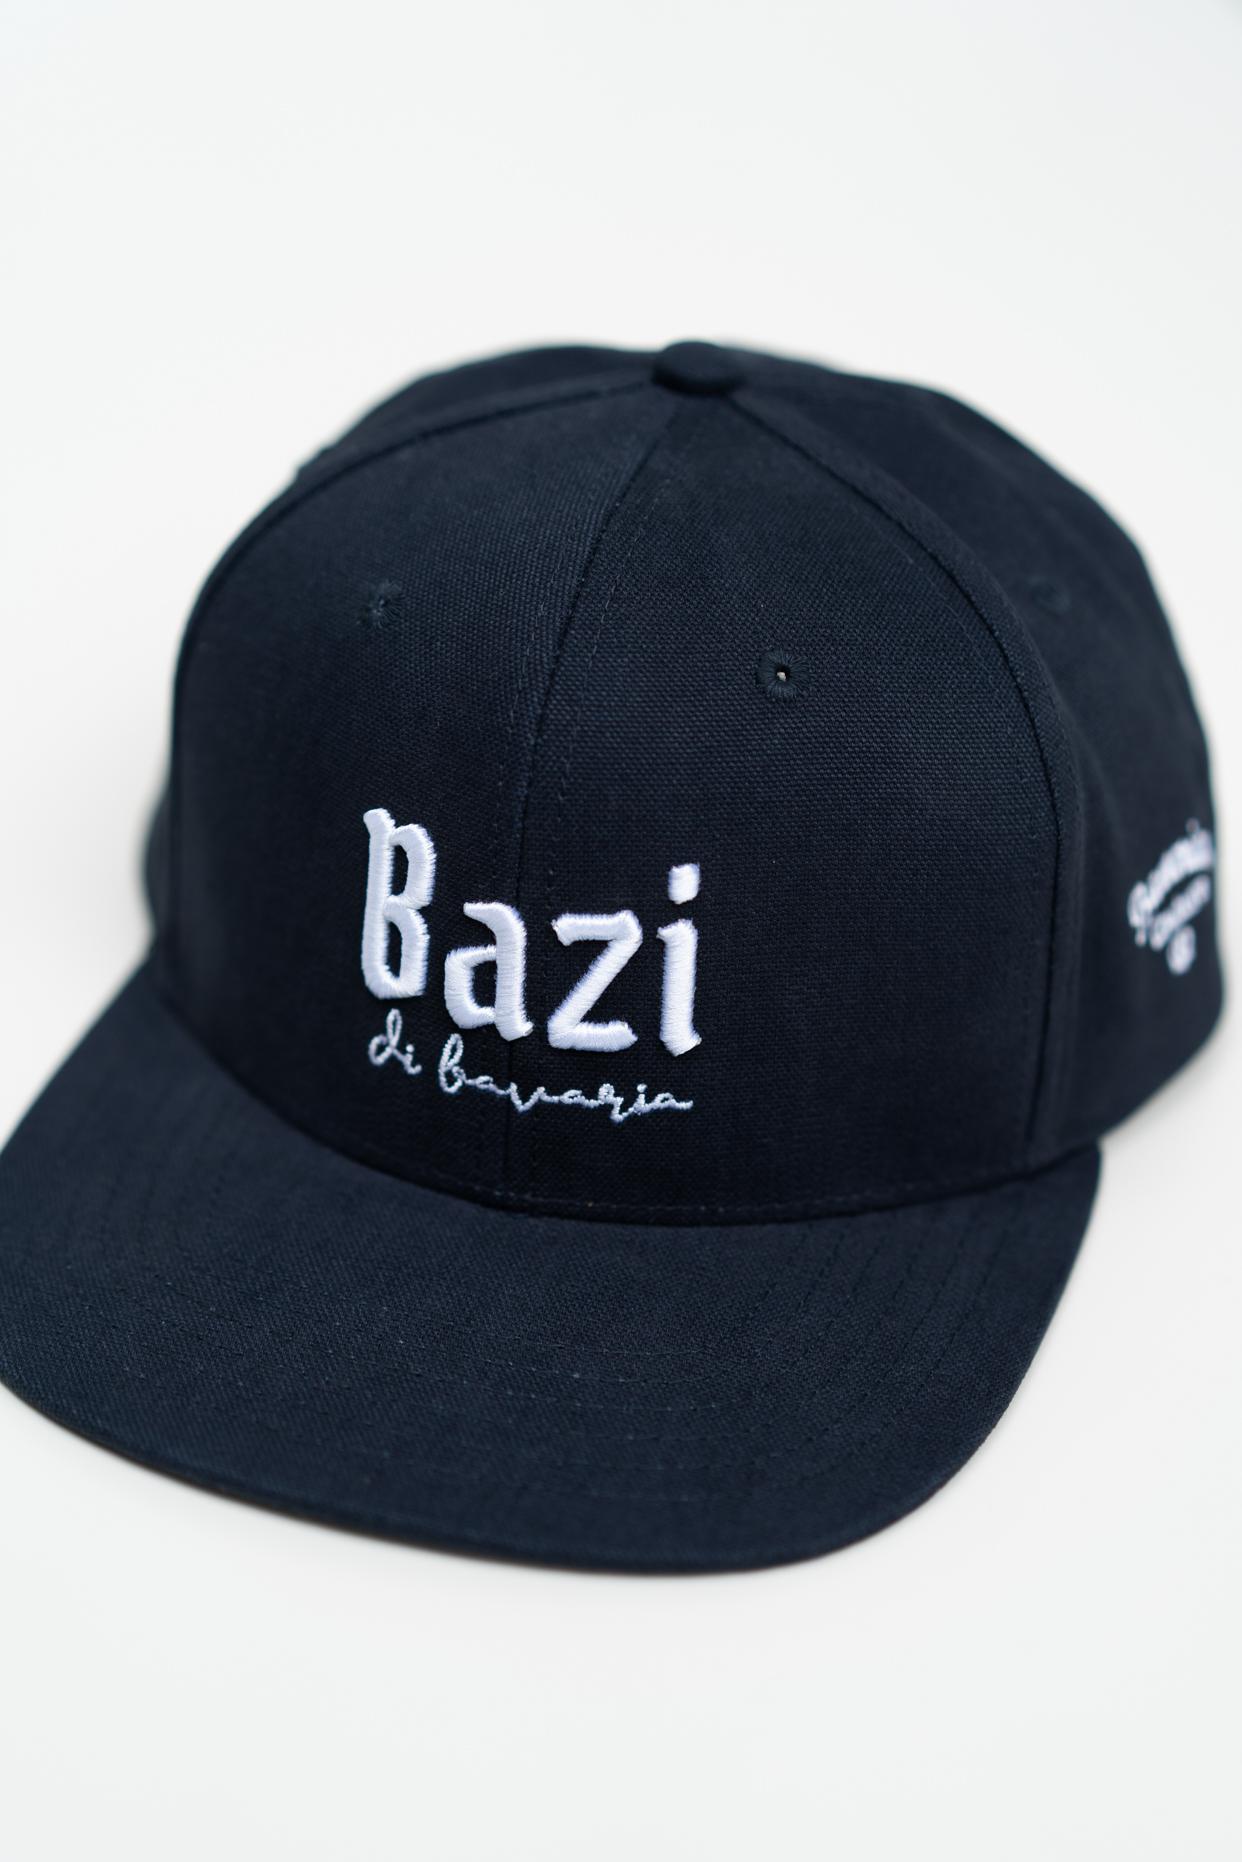 Snapback Bazi di Bavaria